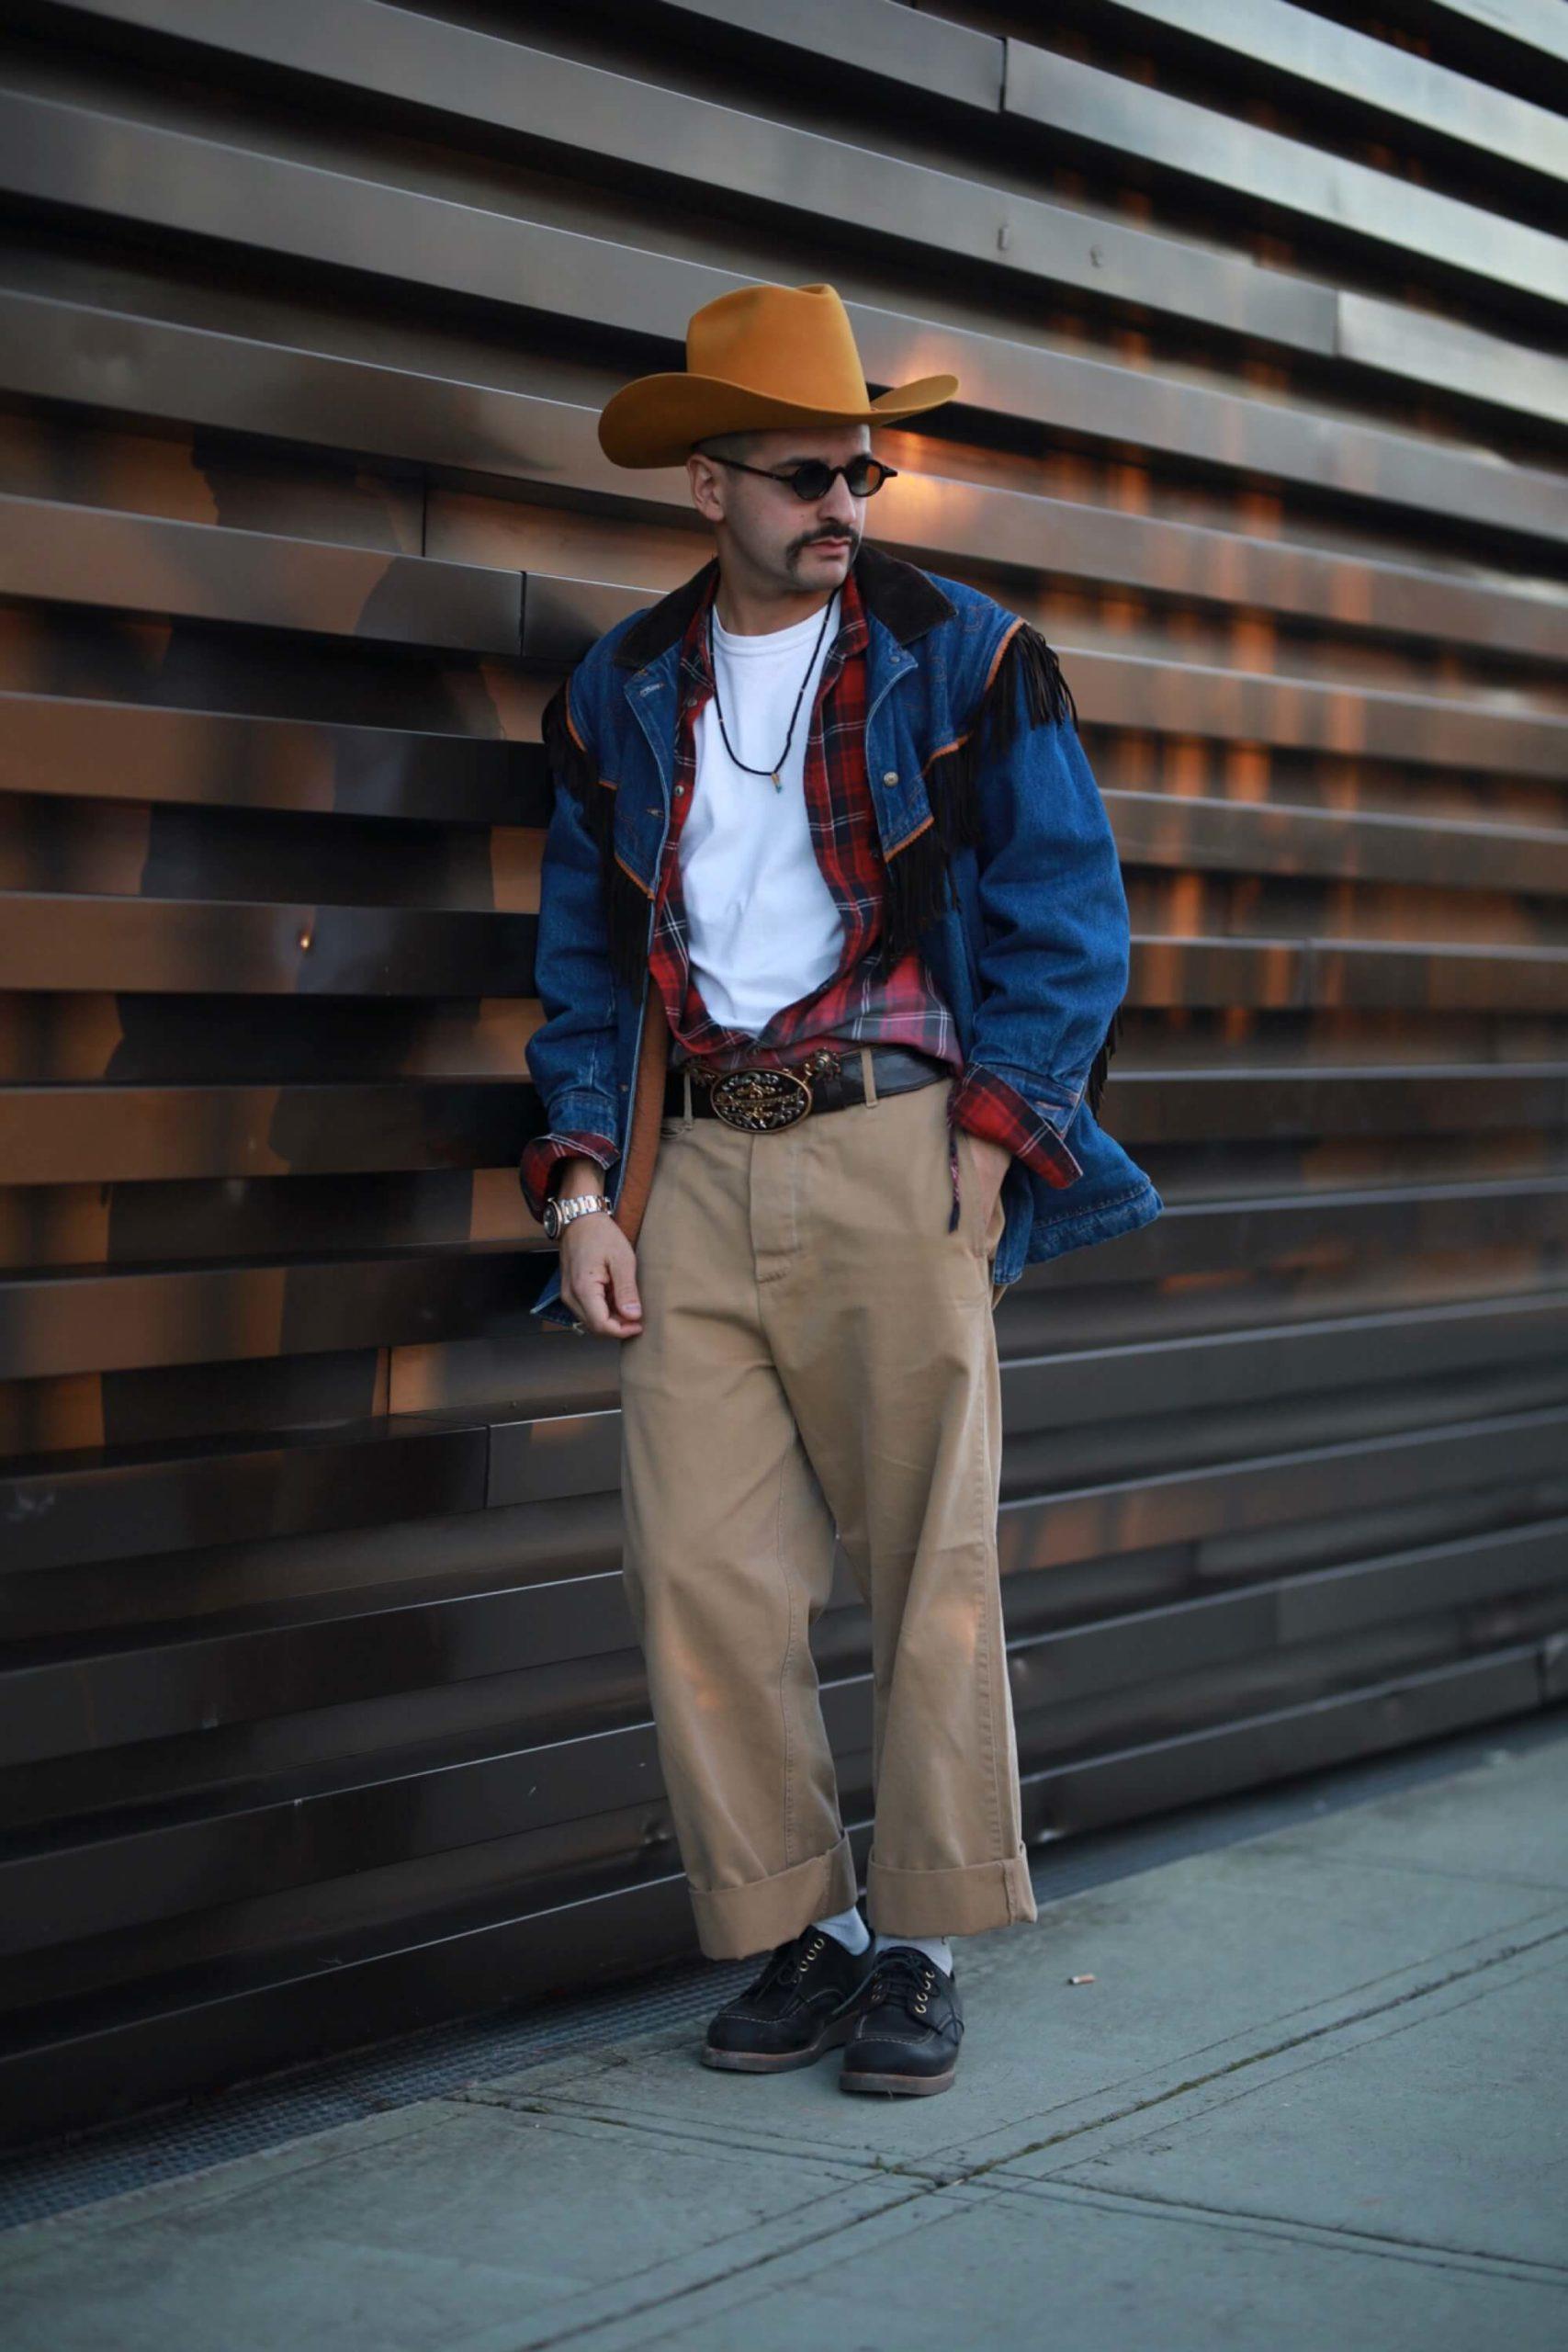 kapelusz kowbojski